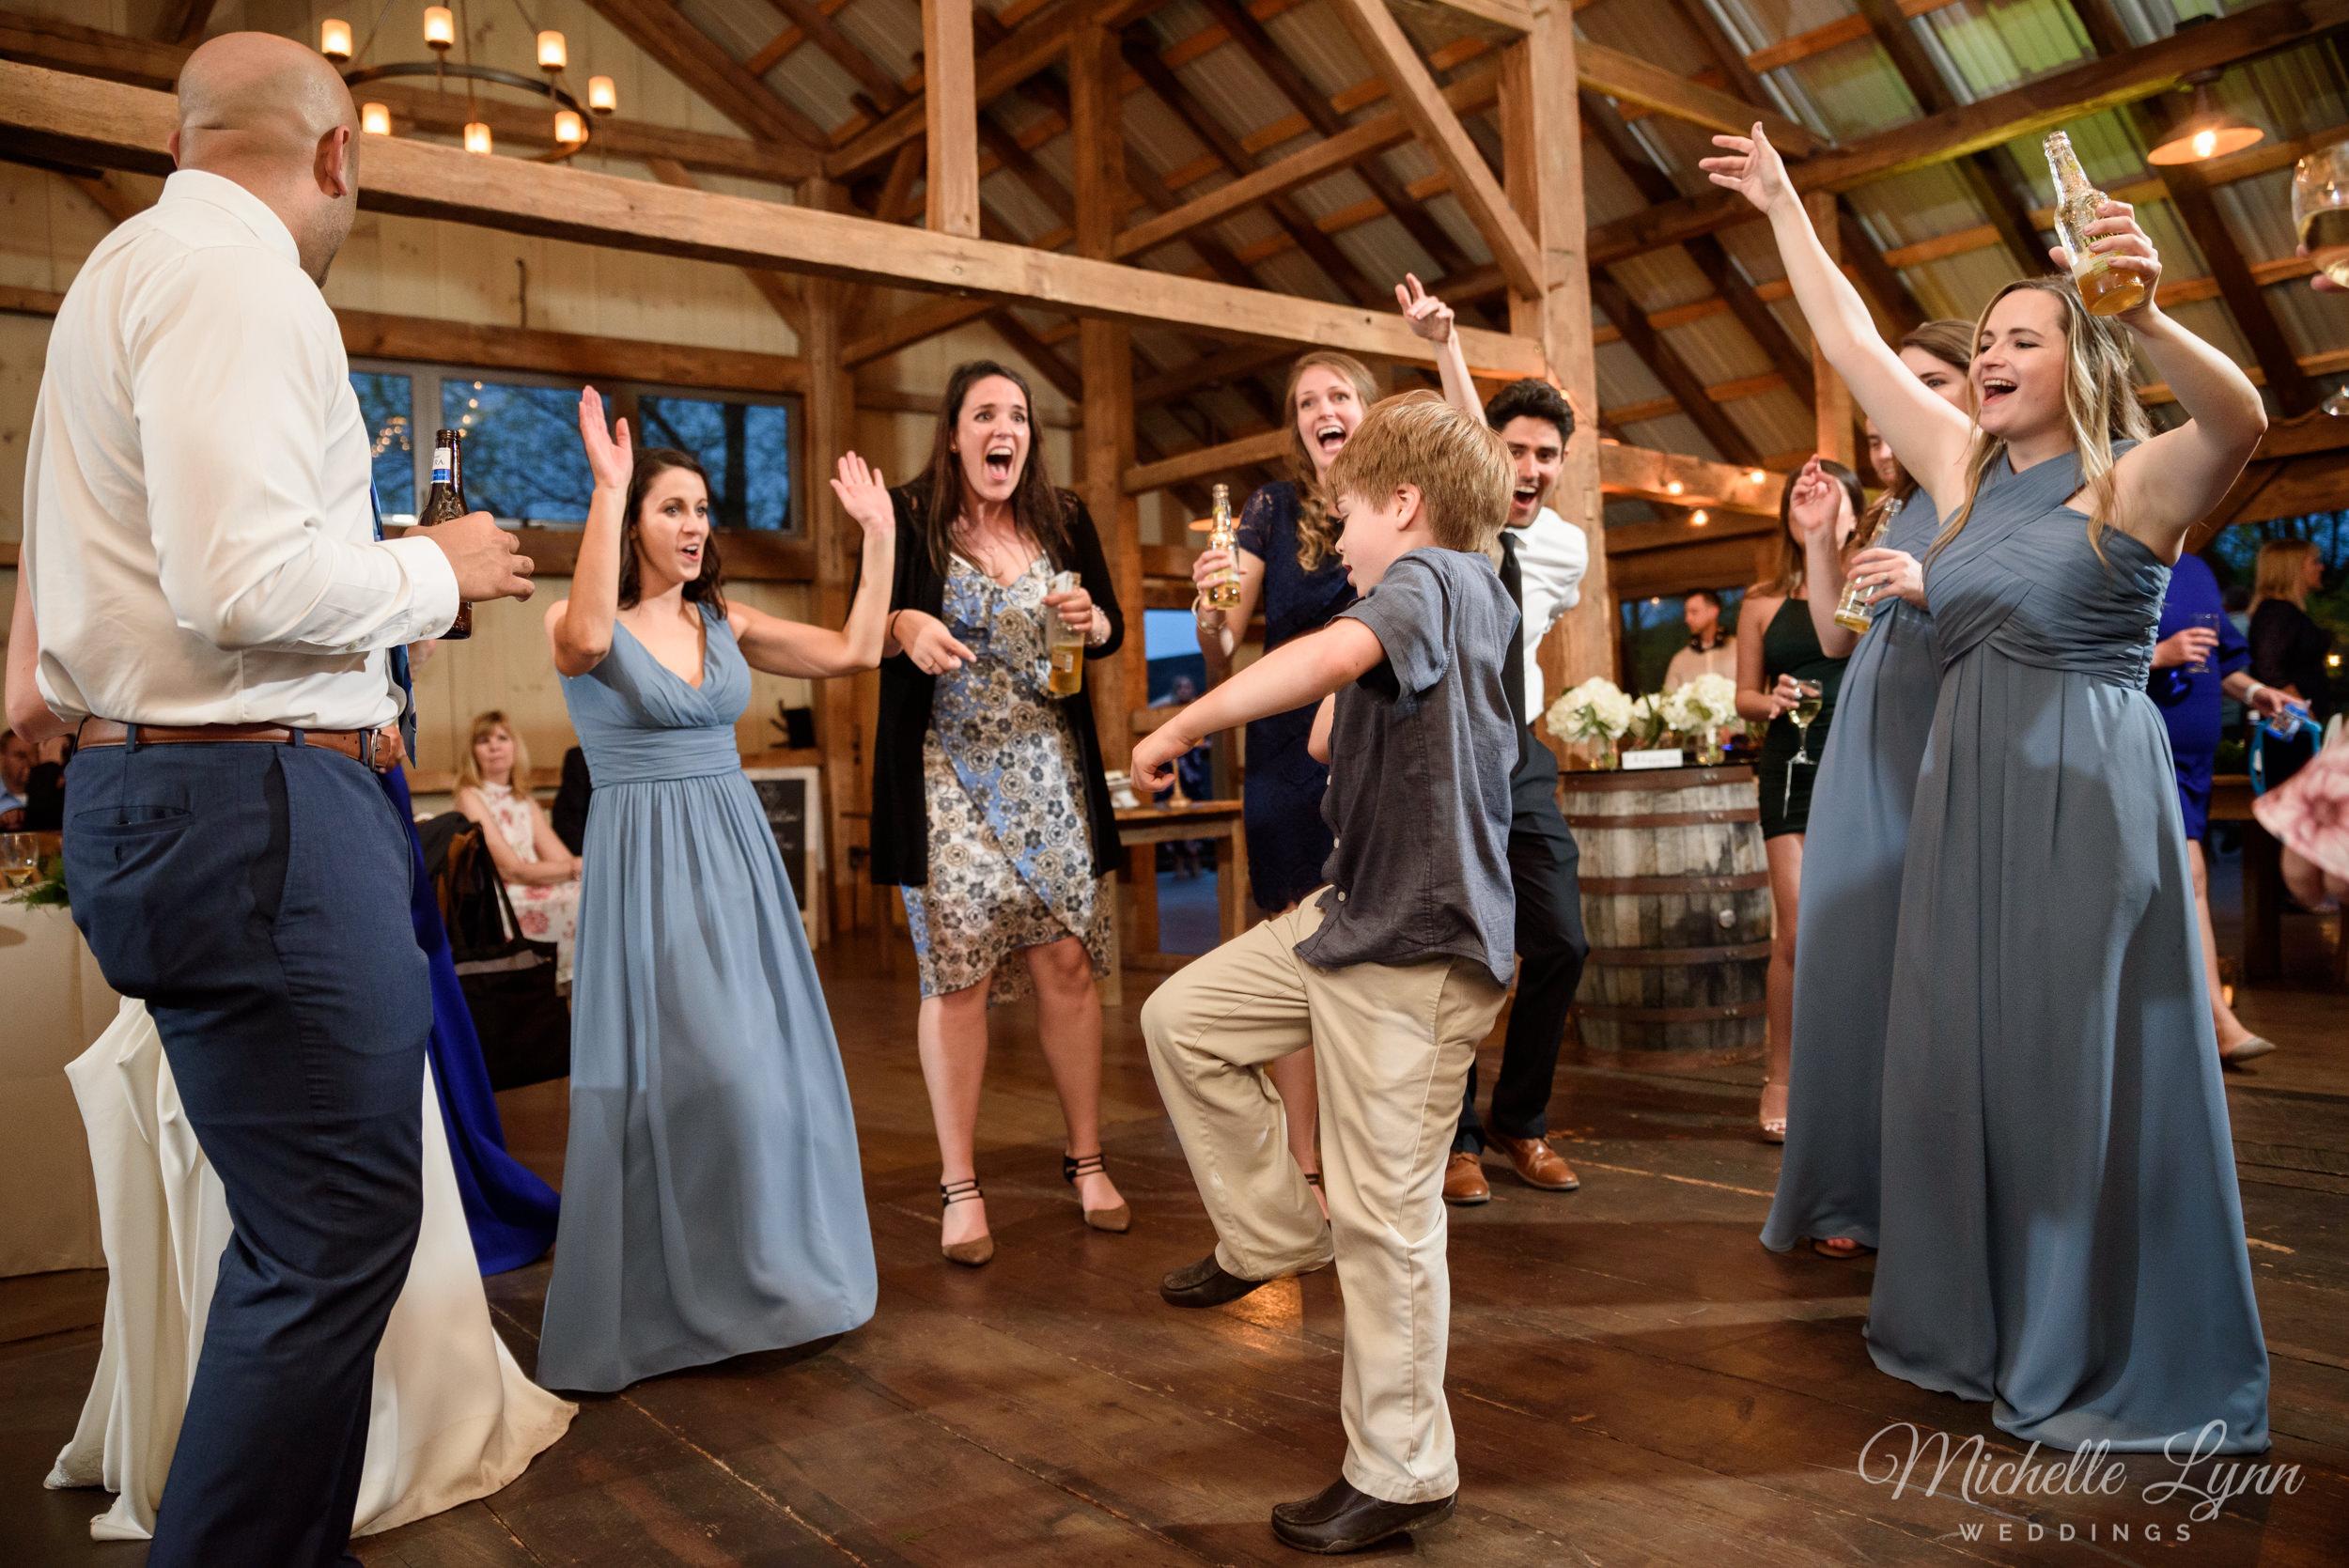 mlw-the-farm-bakery-and-events-wedding-photos-86.jpg